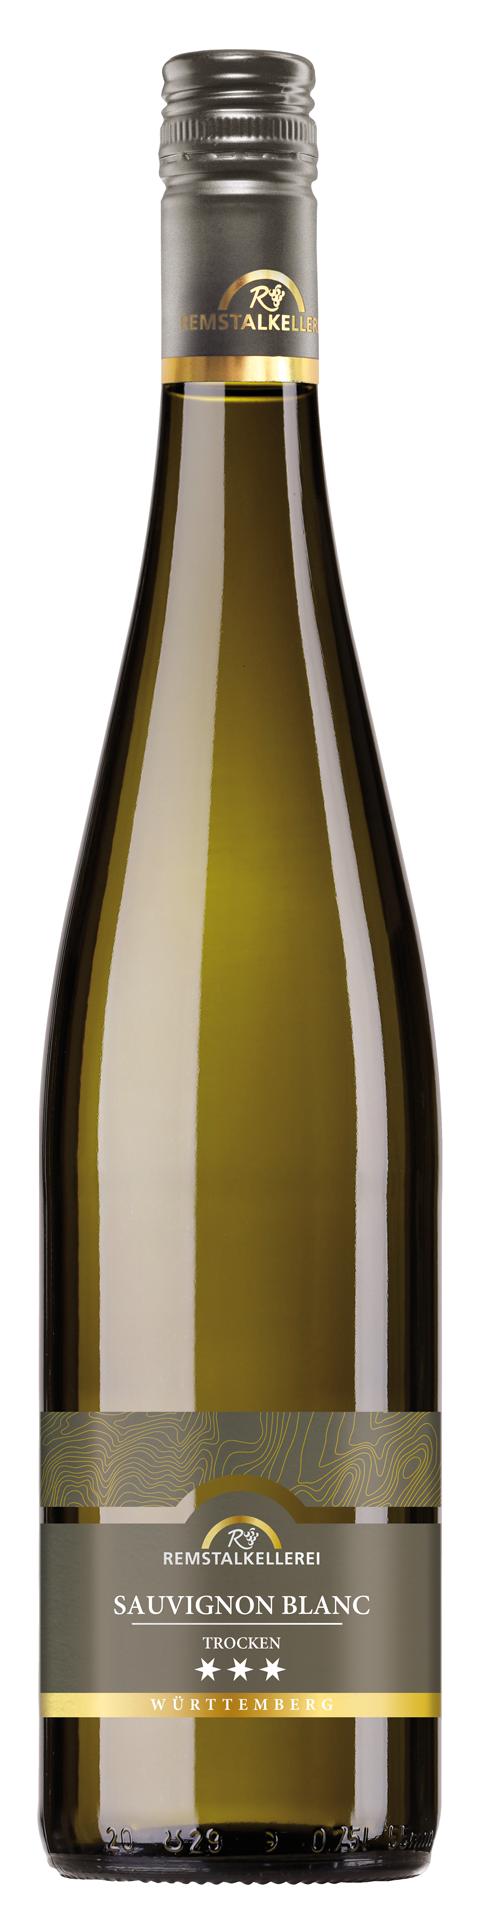 Sauvignon Blanc *** trocken